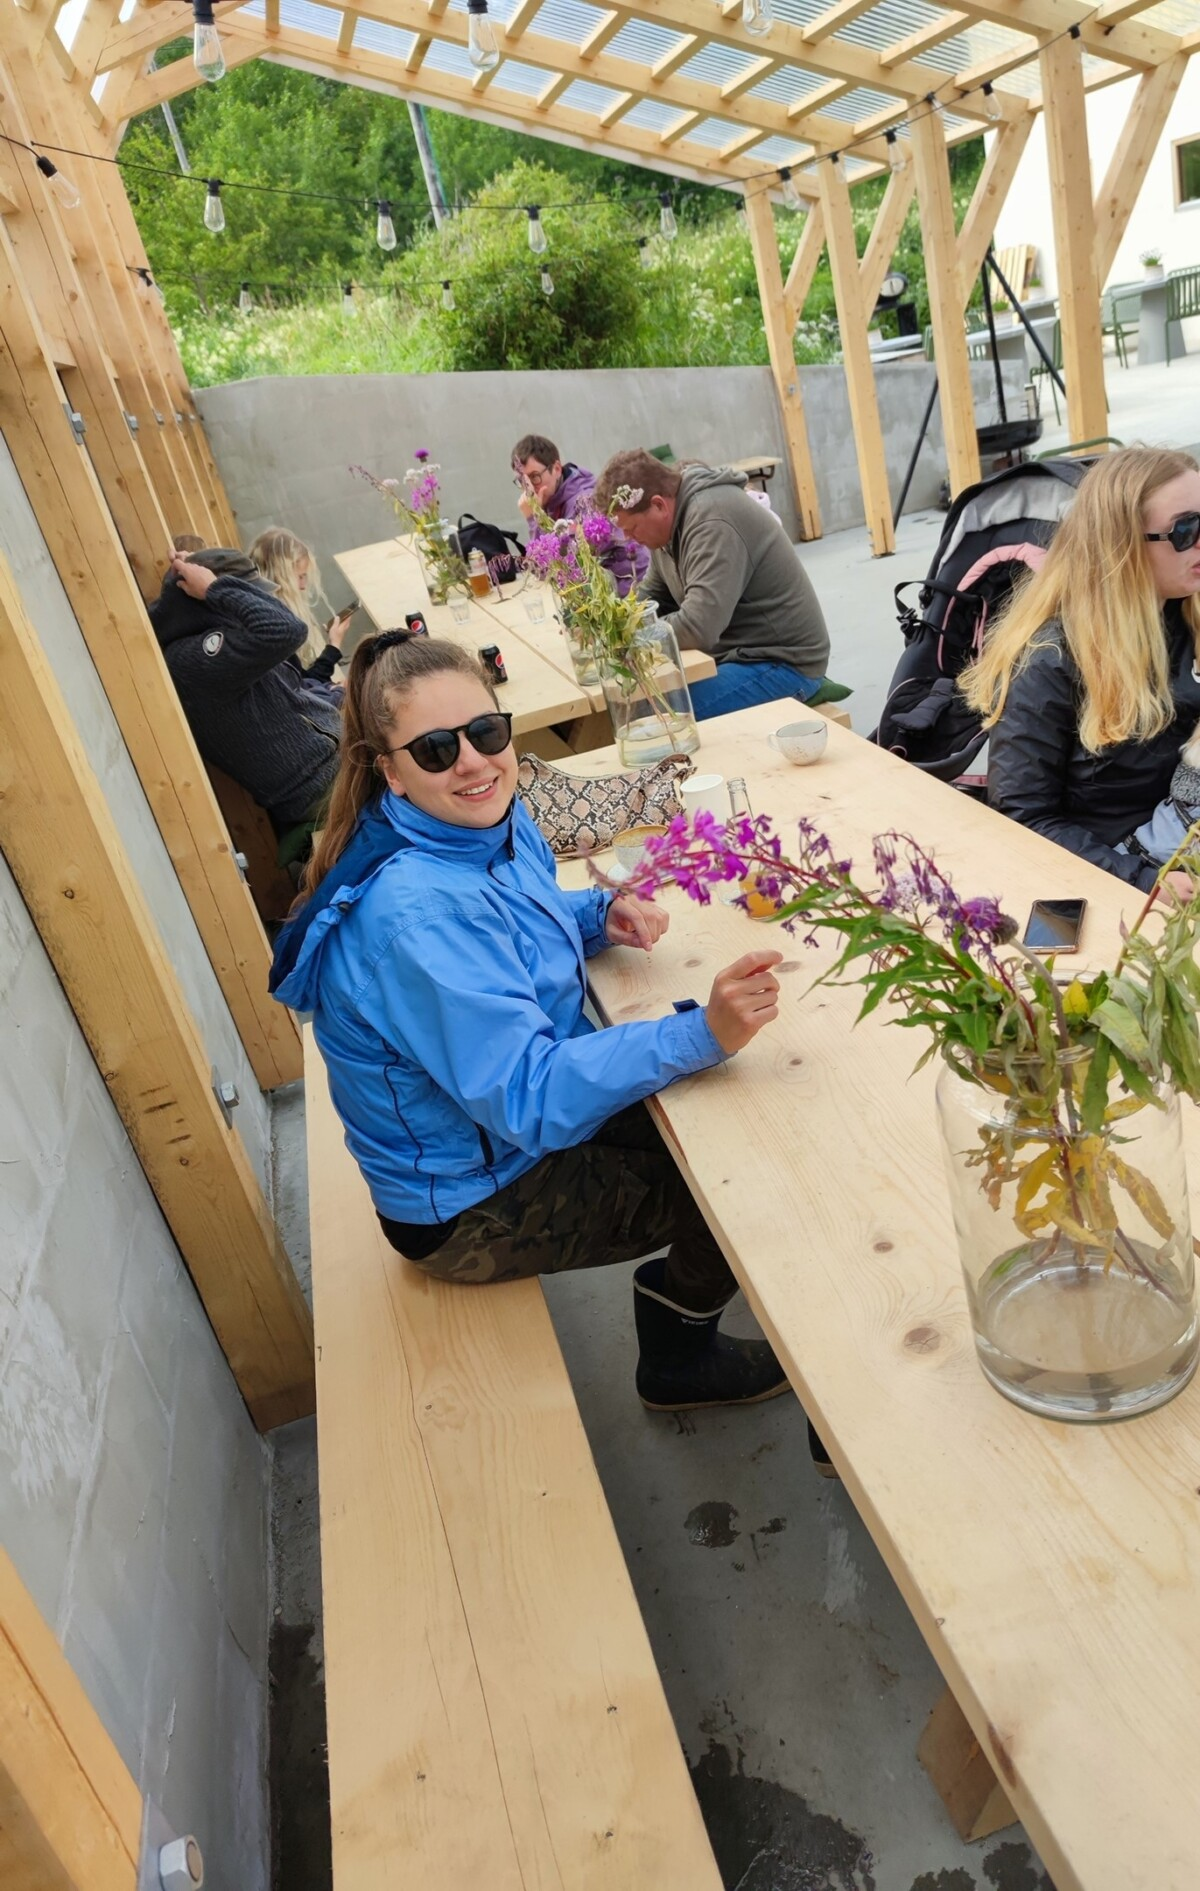 bildedryss-bilder-nordnorge-nord-norge-seløy-seløya-helgeland-herøy-sandnessjøen-mosjøen-natur-norge-norway-northofnorway-trondheim-vakkernatur-isalicious-klartvann-strang-norgesommer-norgessommer-sommer-helgelandskysten-isalicious.blogg.no-skolo